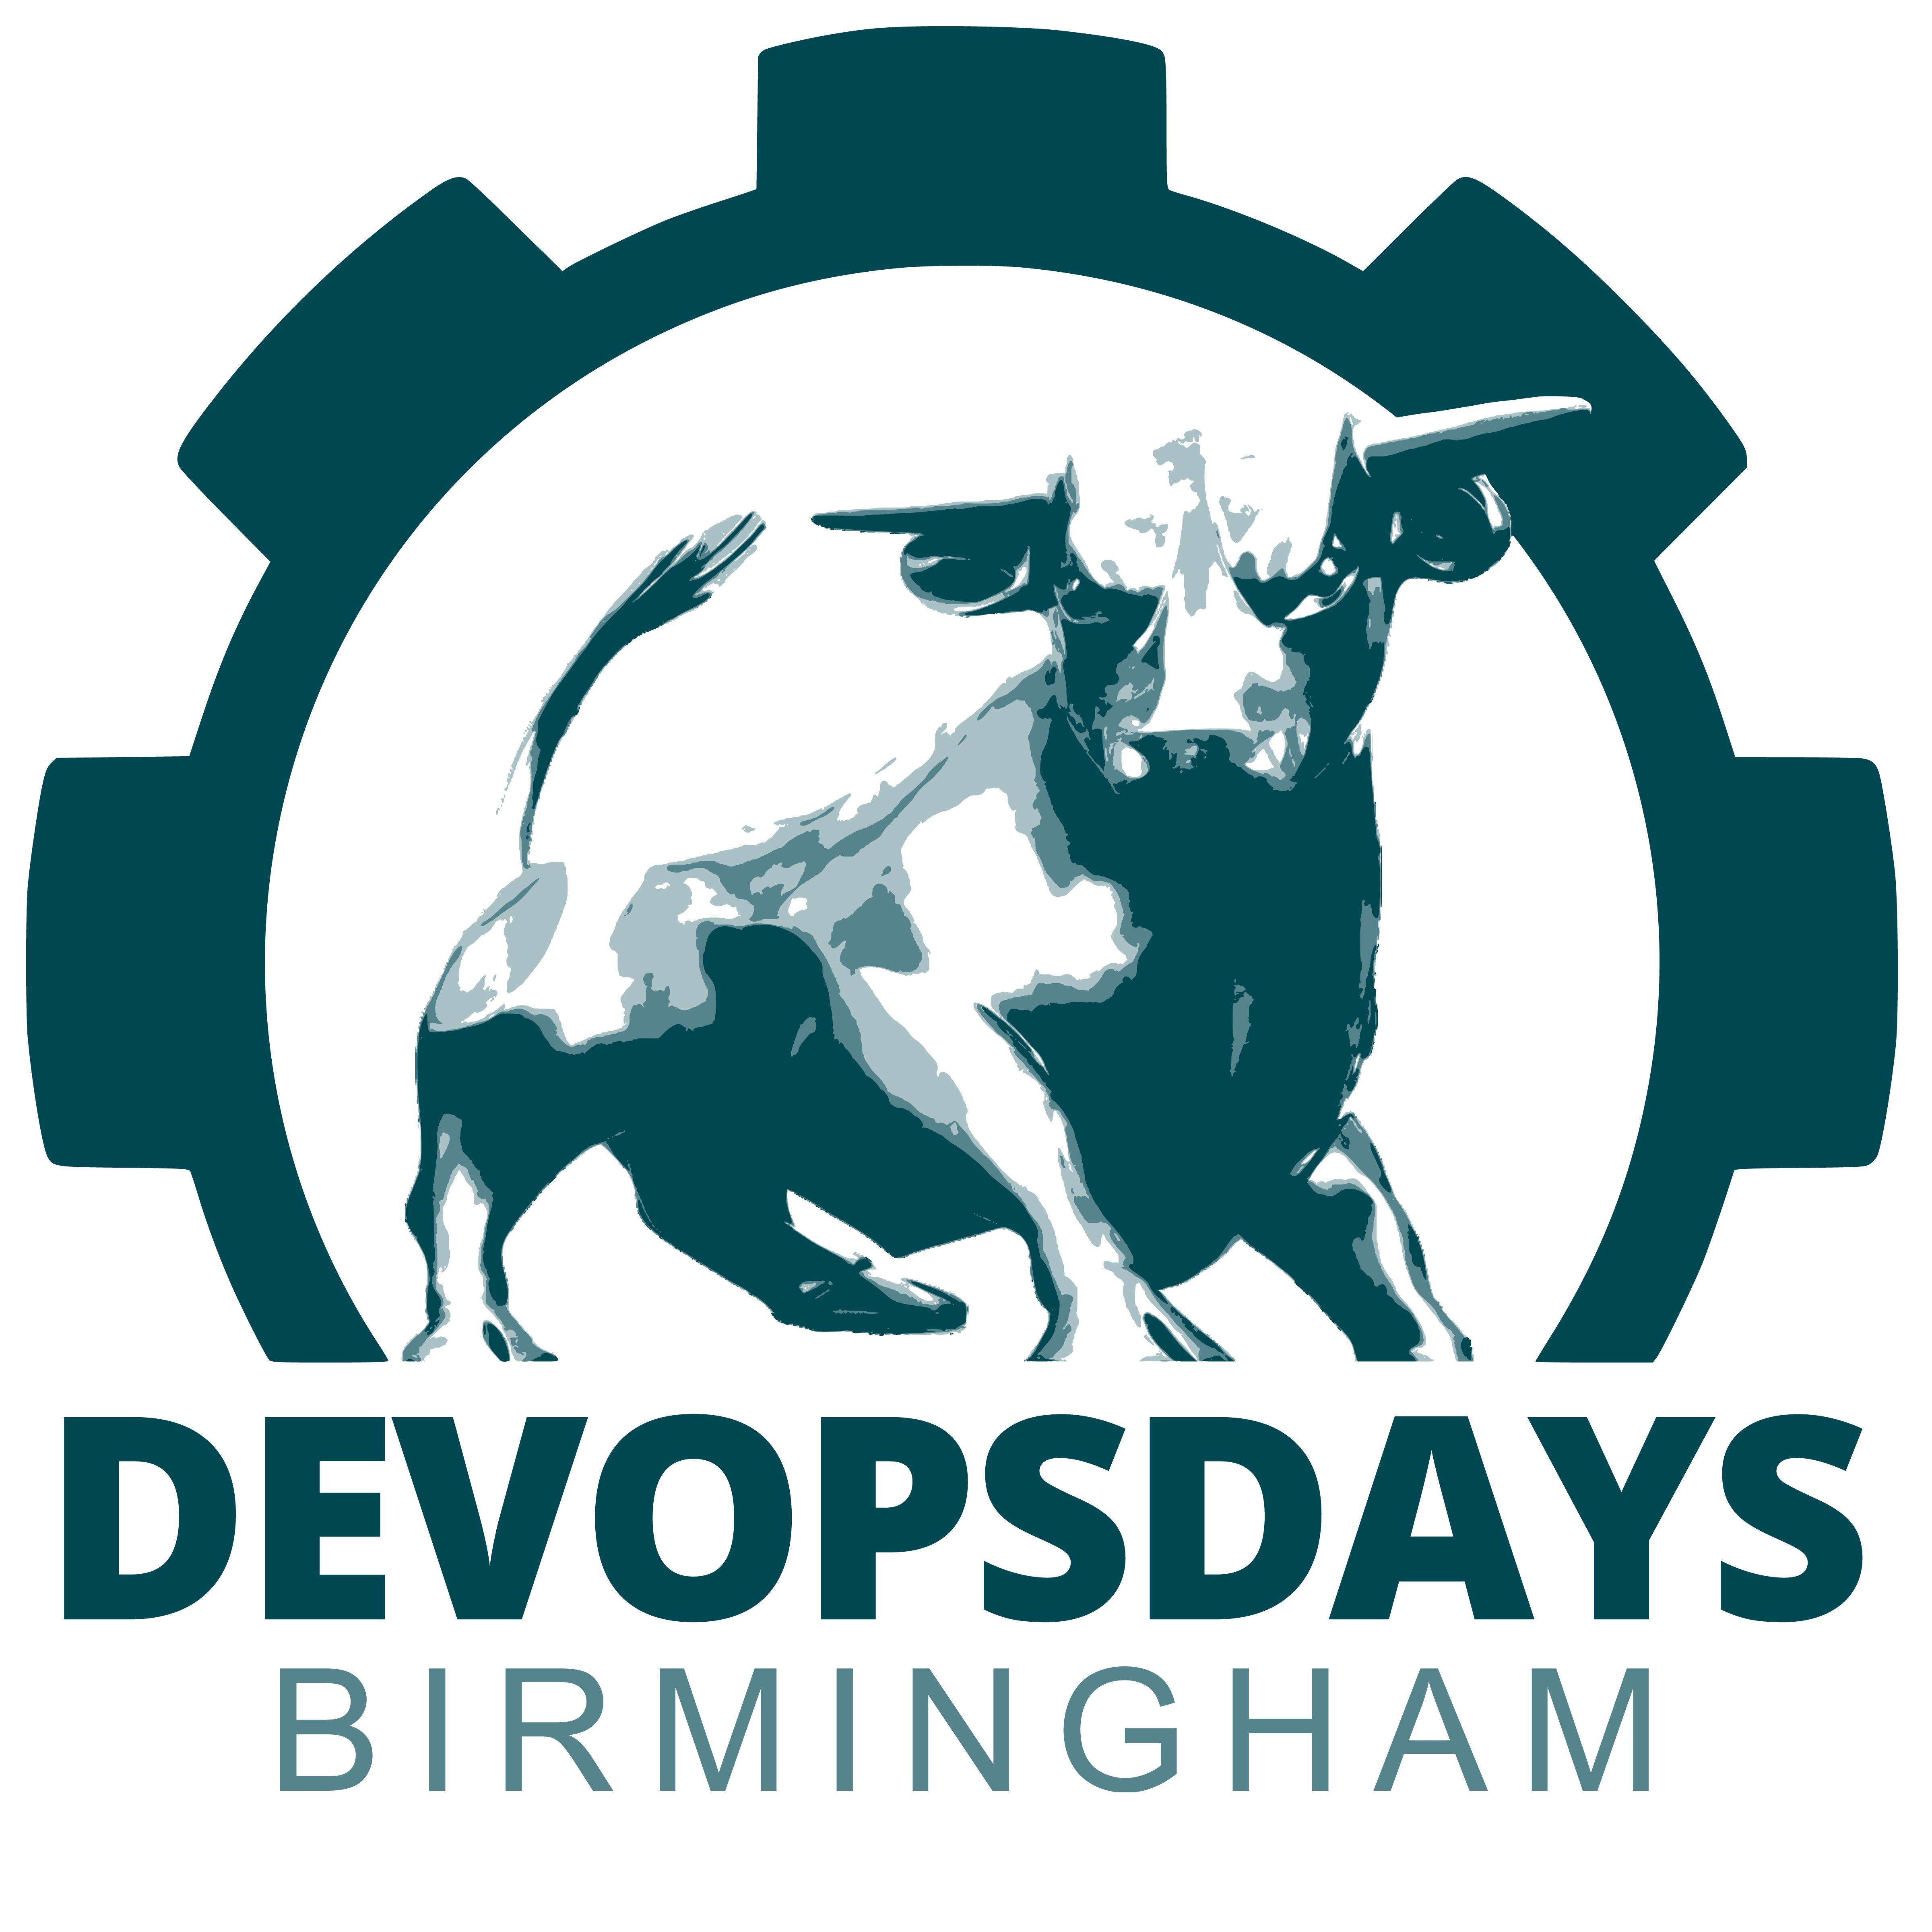 devopsdays Birmingham